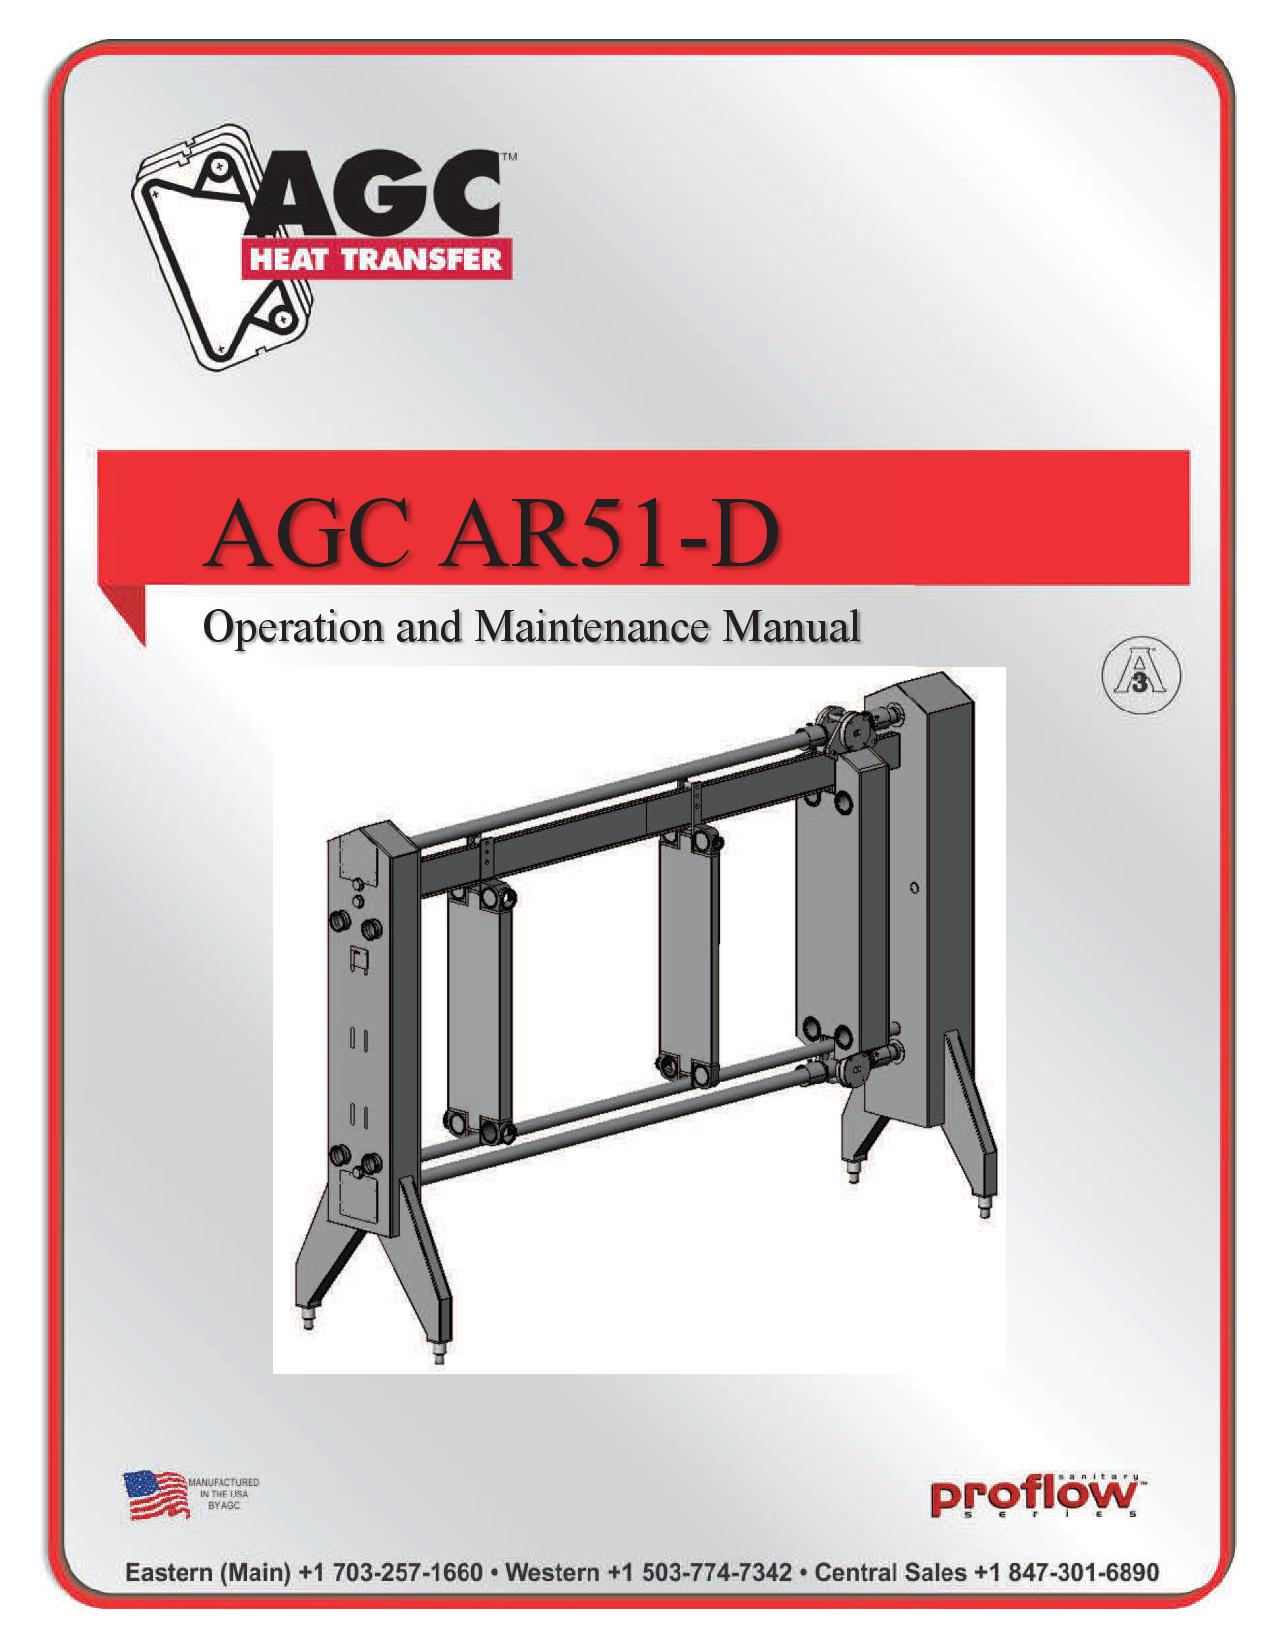 AGC Operating Manual AR51-D